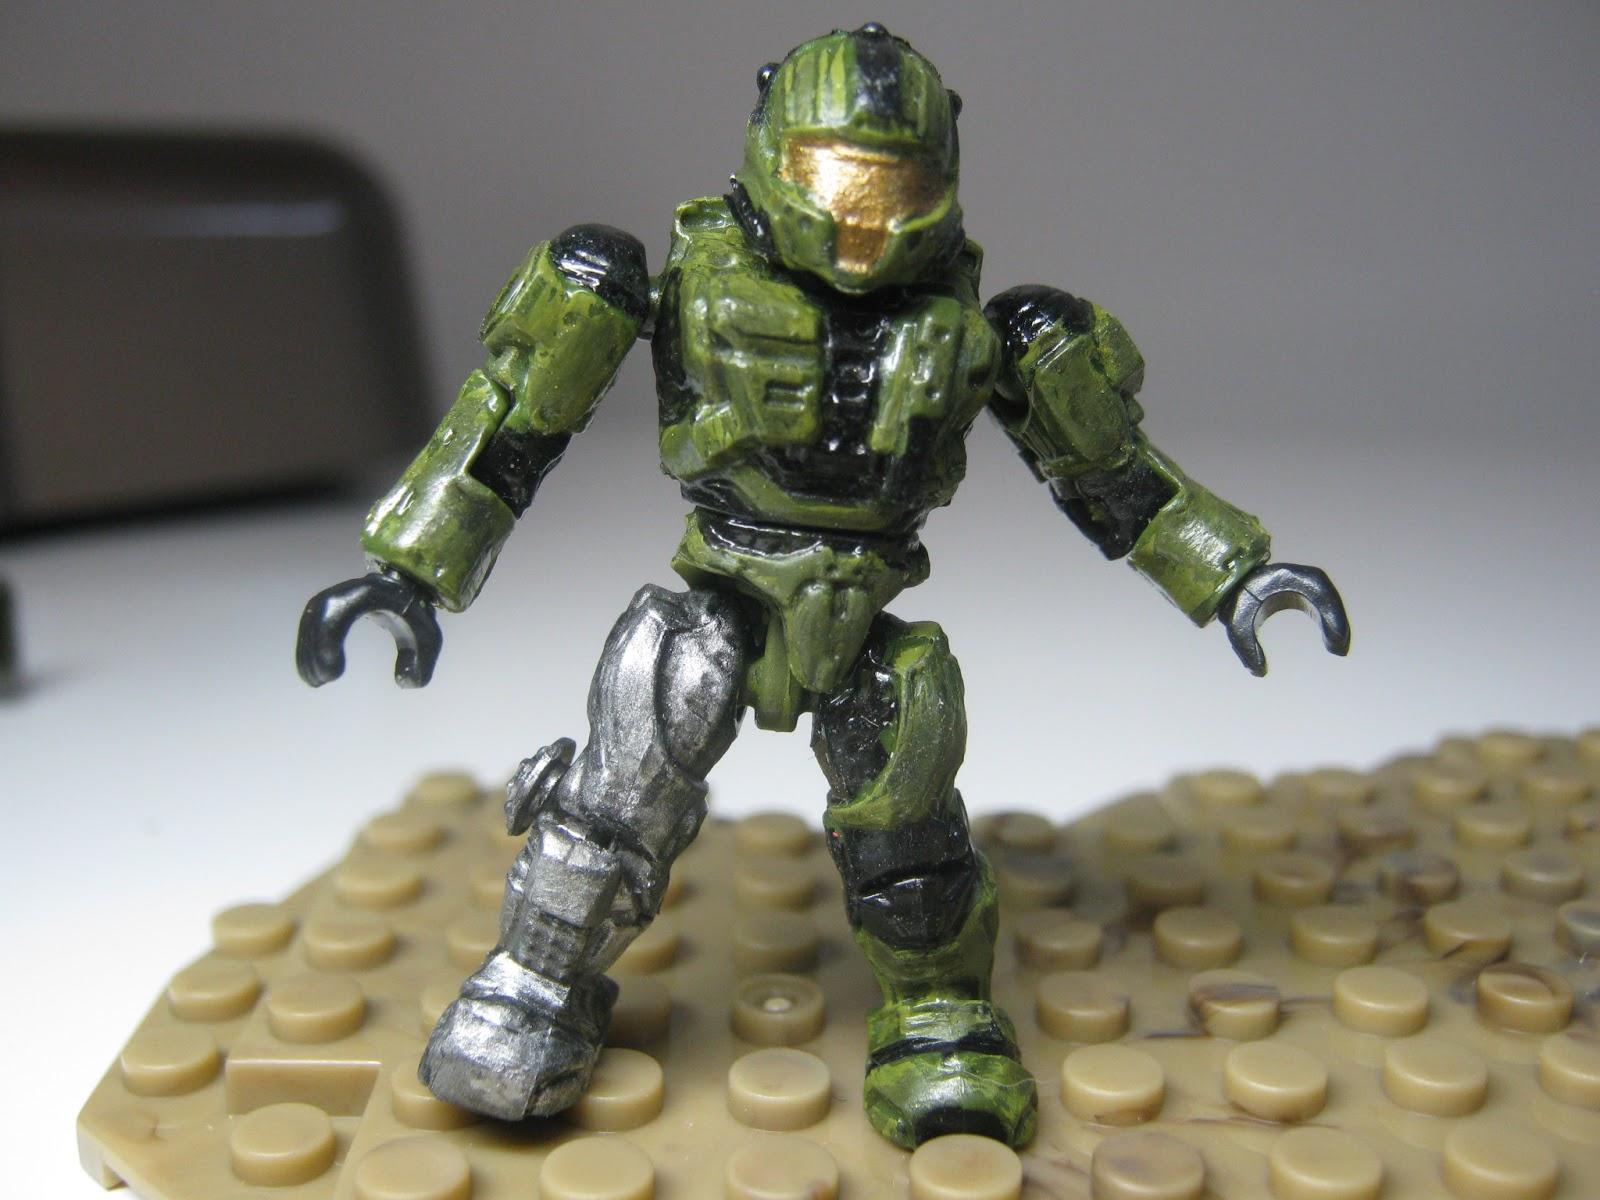 Images of Custom Halo Mega Bloks Figures - #rock-cafe